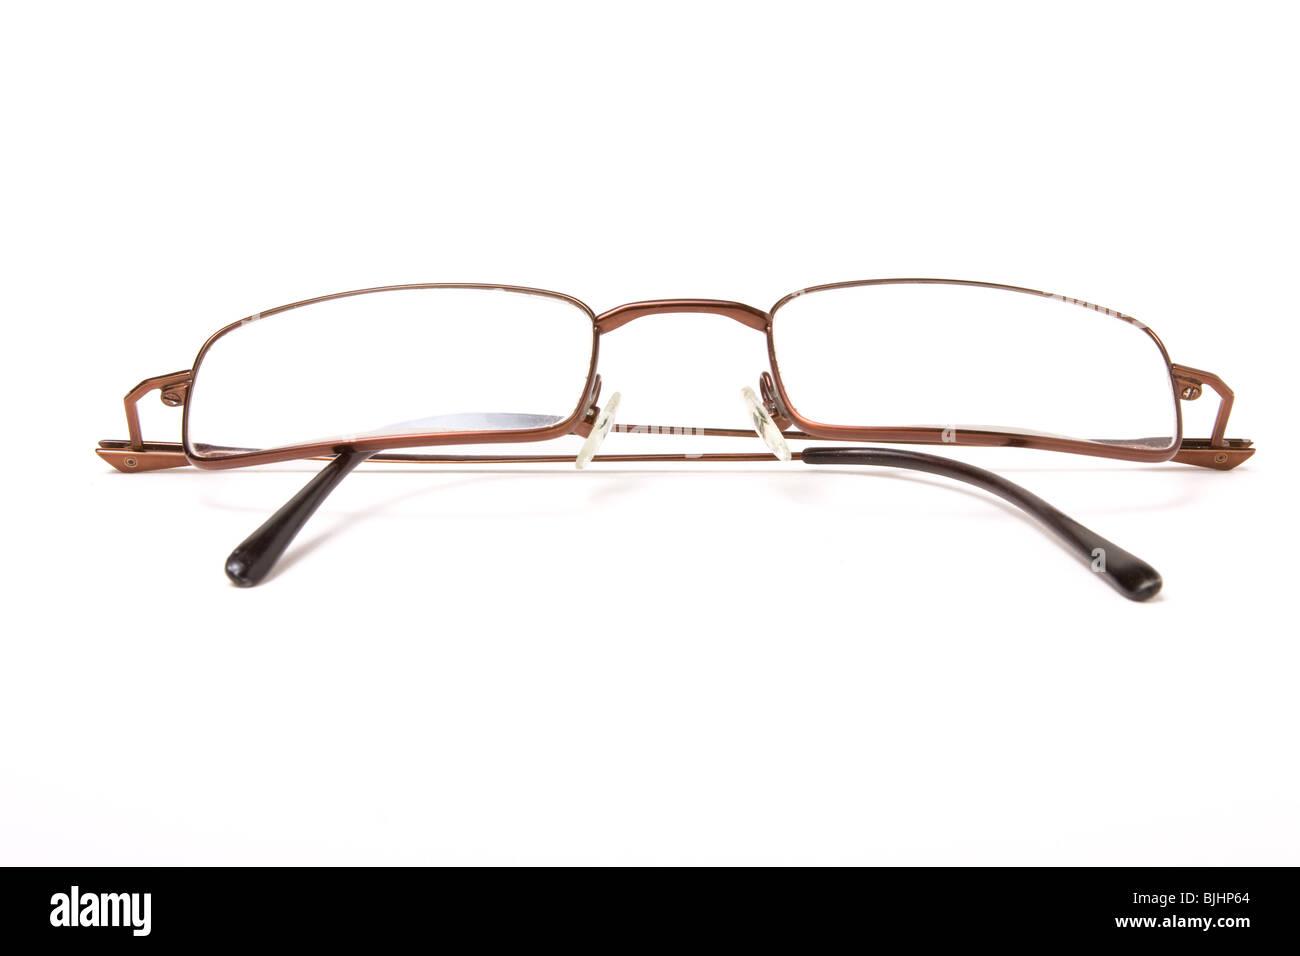 Very Thin Glasses Stockfotos & Very Thin Glasses Bilder - Alamy